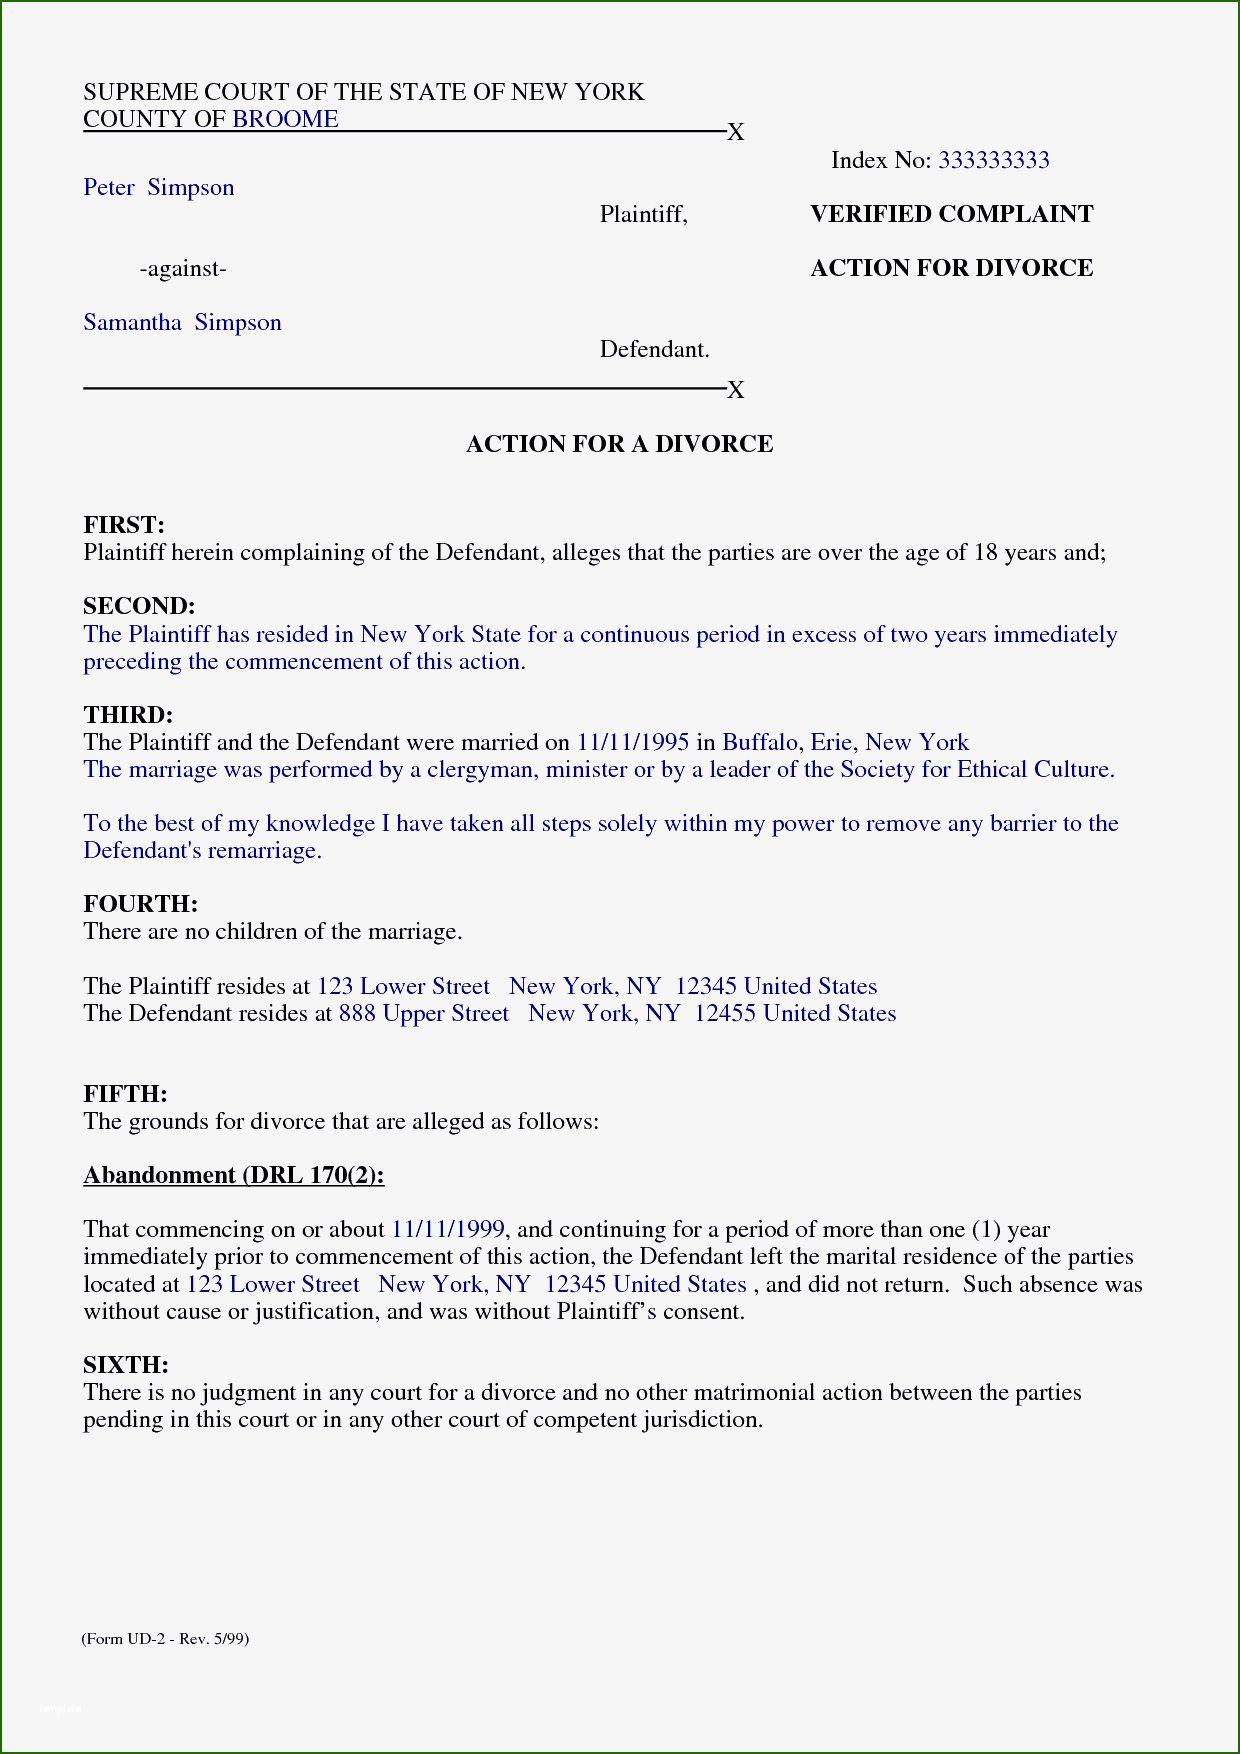 Separation Agreement Template Word 15 Tendency Of 2020 in